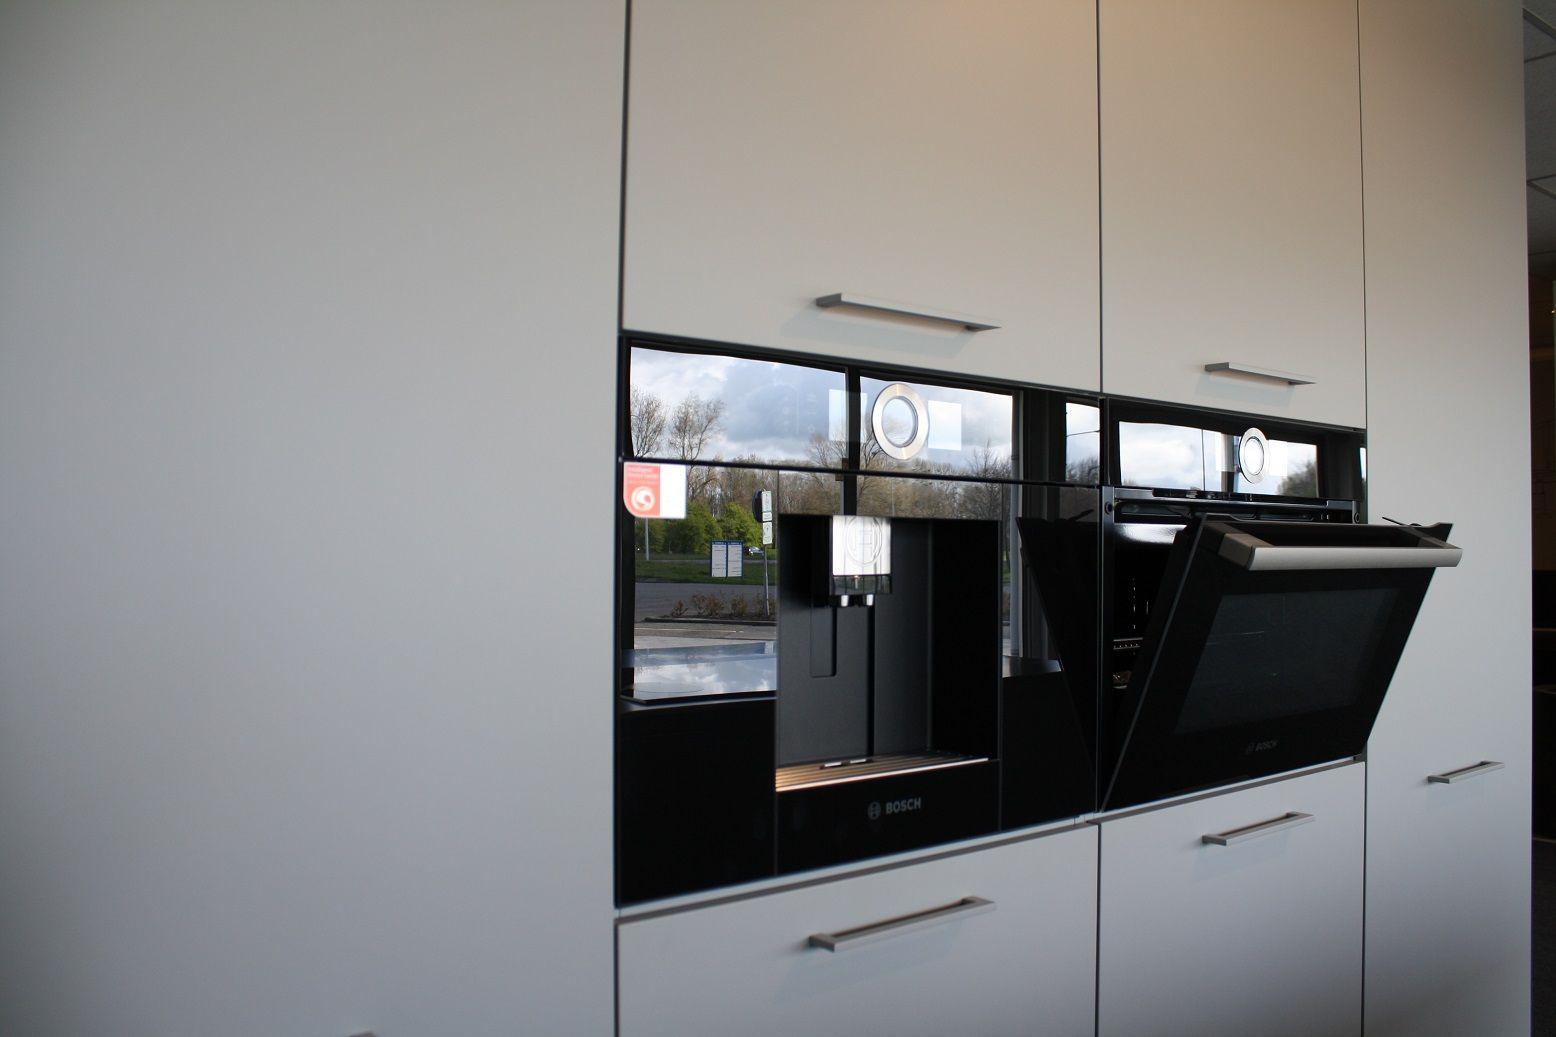 Allergrootste keukensite van nederland for Bosch apparatuur